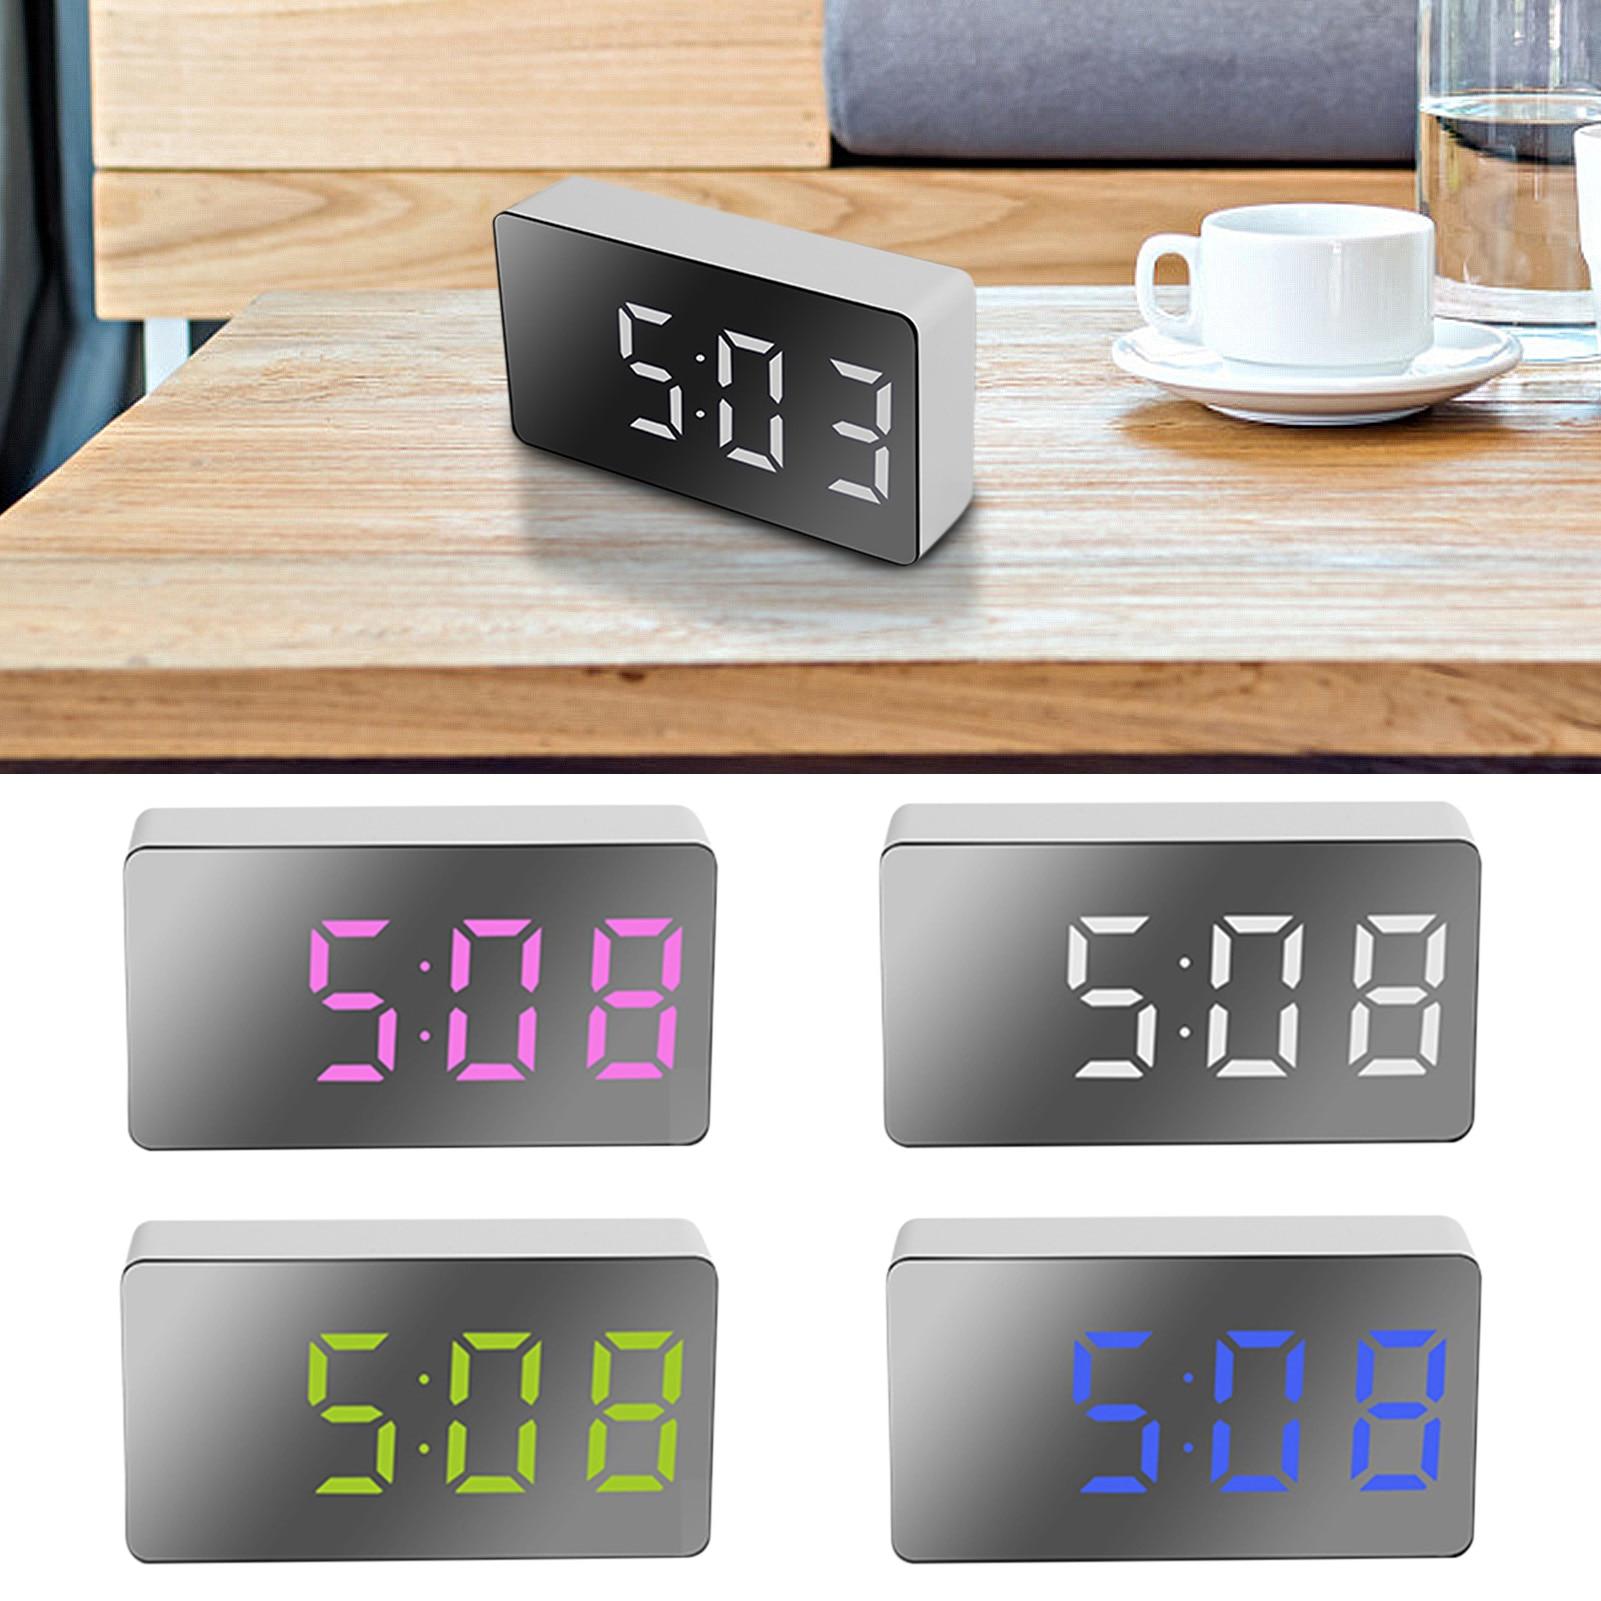 Mini Desk Alarm Clock Digital Mirror LED Big Display Bedroom Snooze Timer Home Electronic Table Cloc